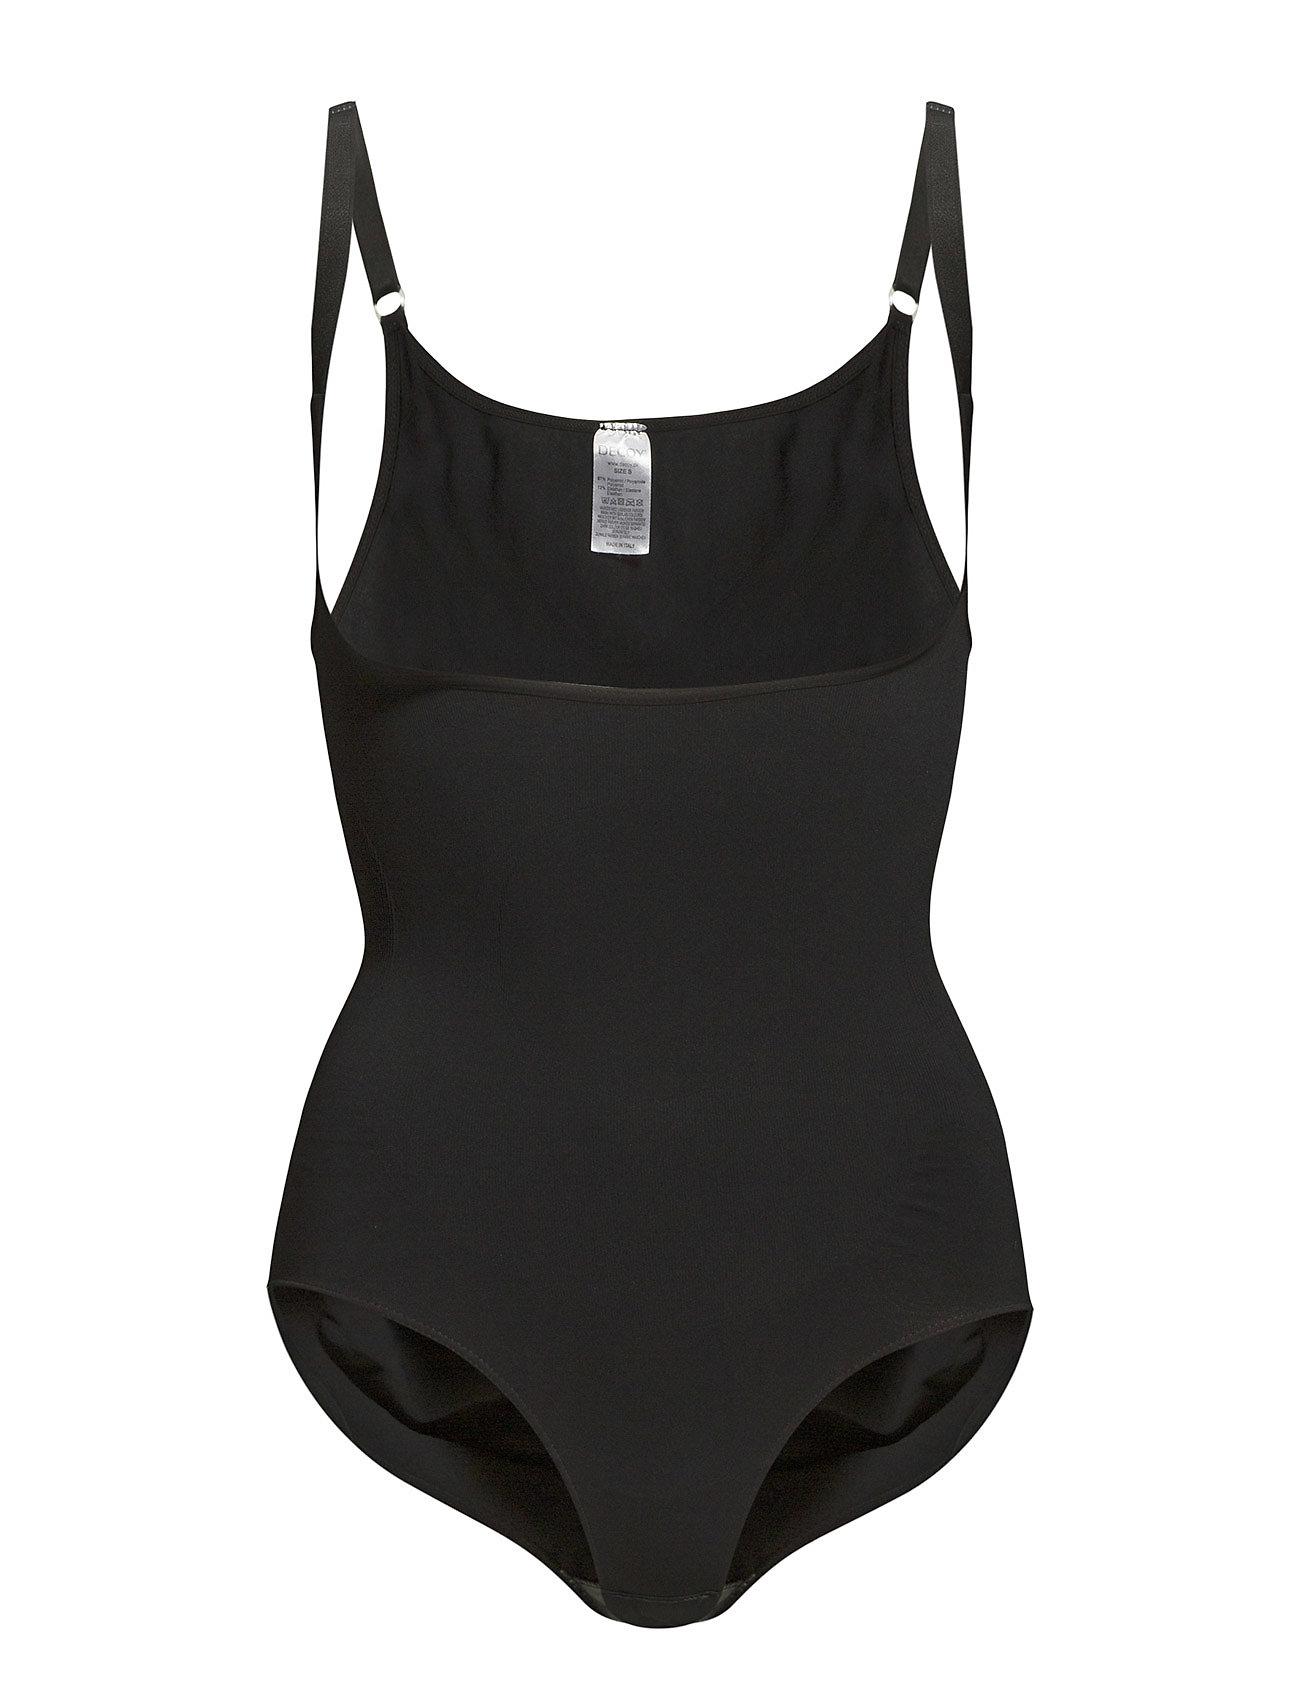 Decoy Shape wear Body stocking - BLACK